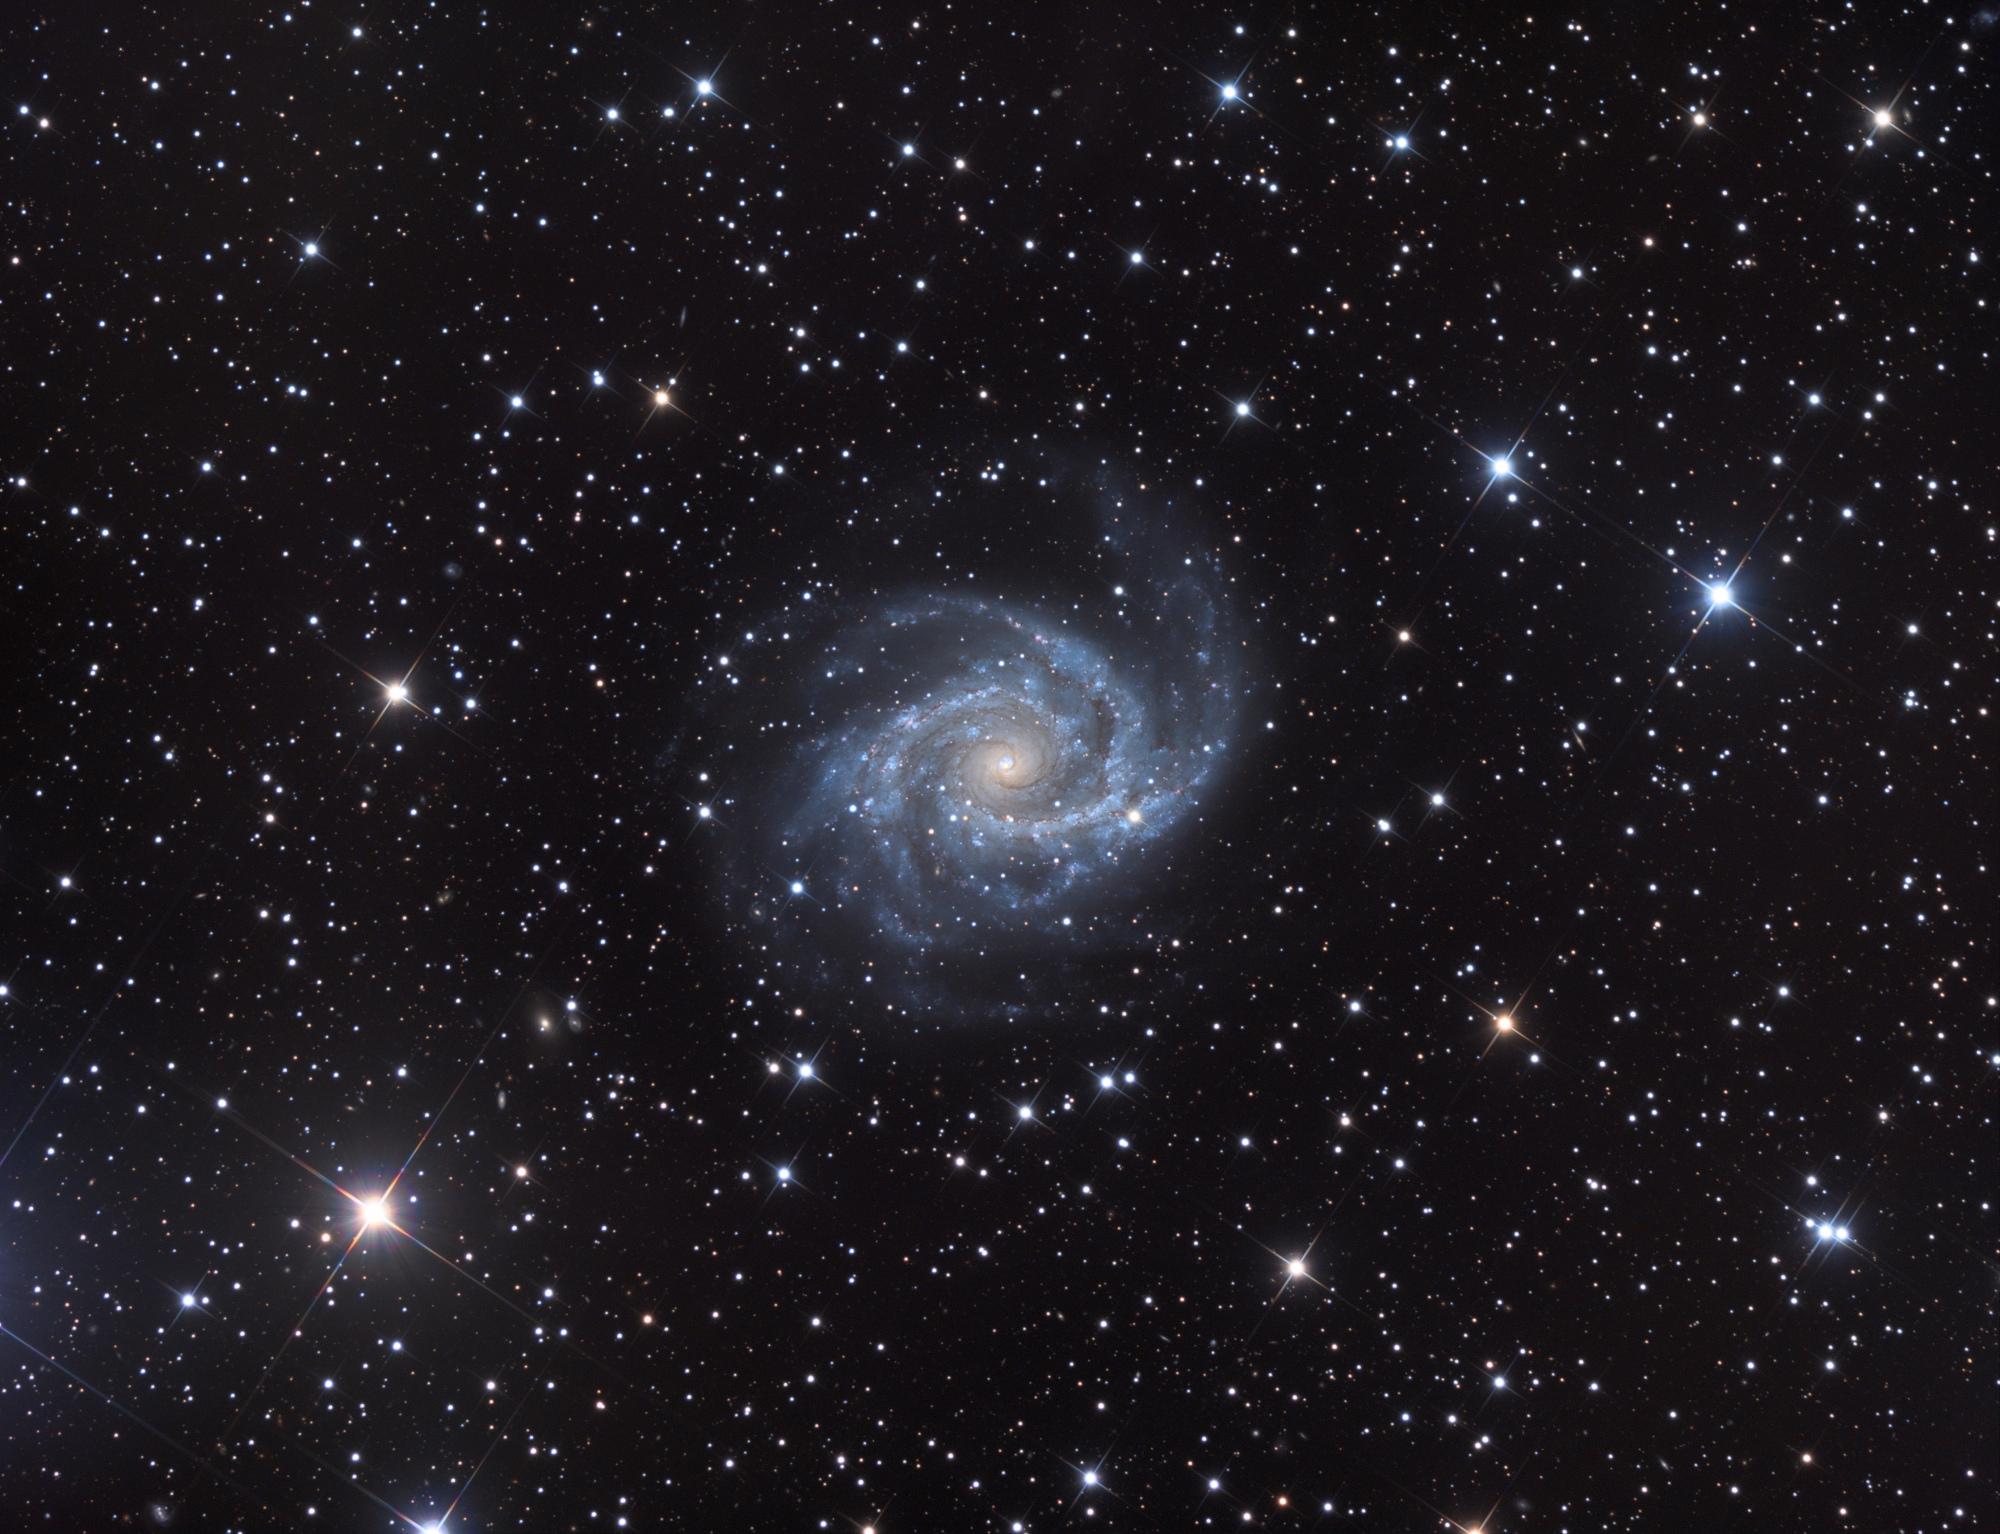 NGC2997LRVB-V3_Log.thumb.jpg.b7d67f24fb9cc0c9e74e3c461d9e4c9c.jpg